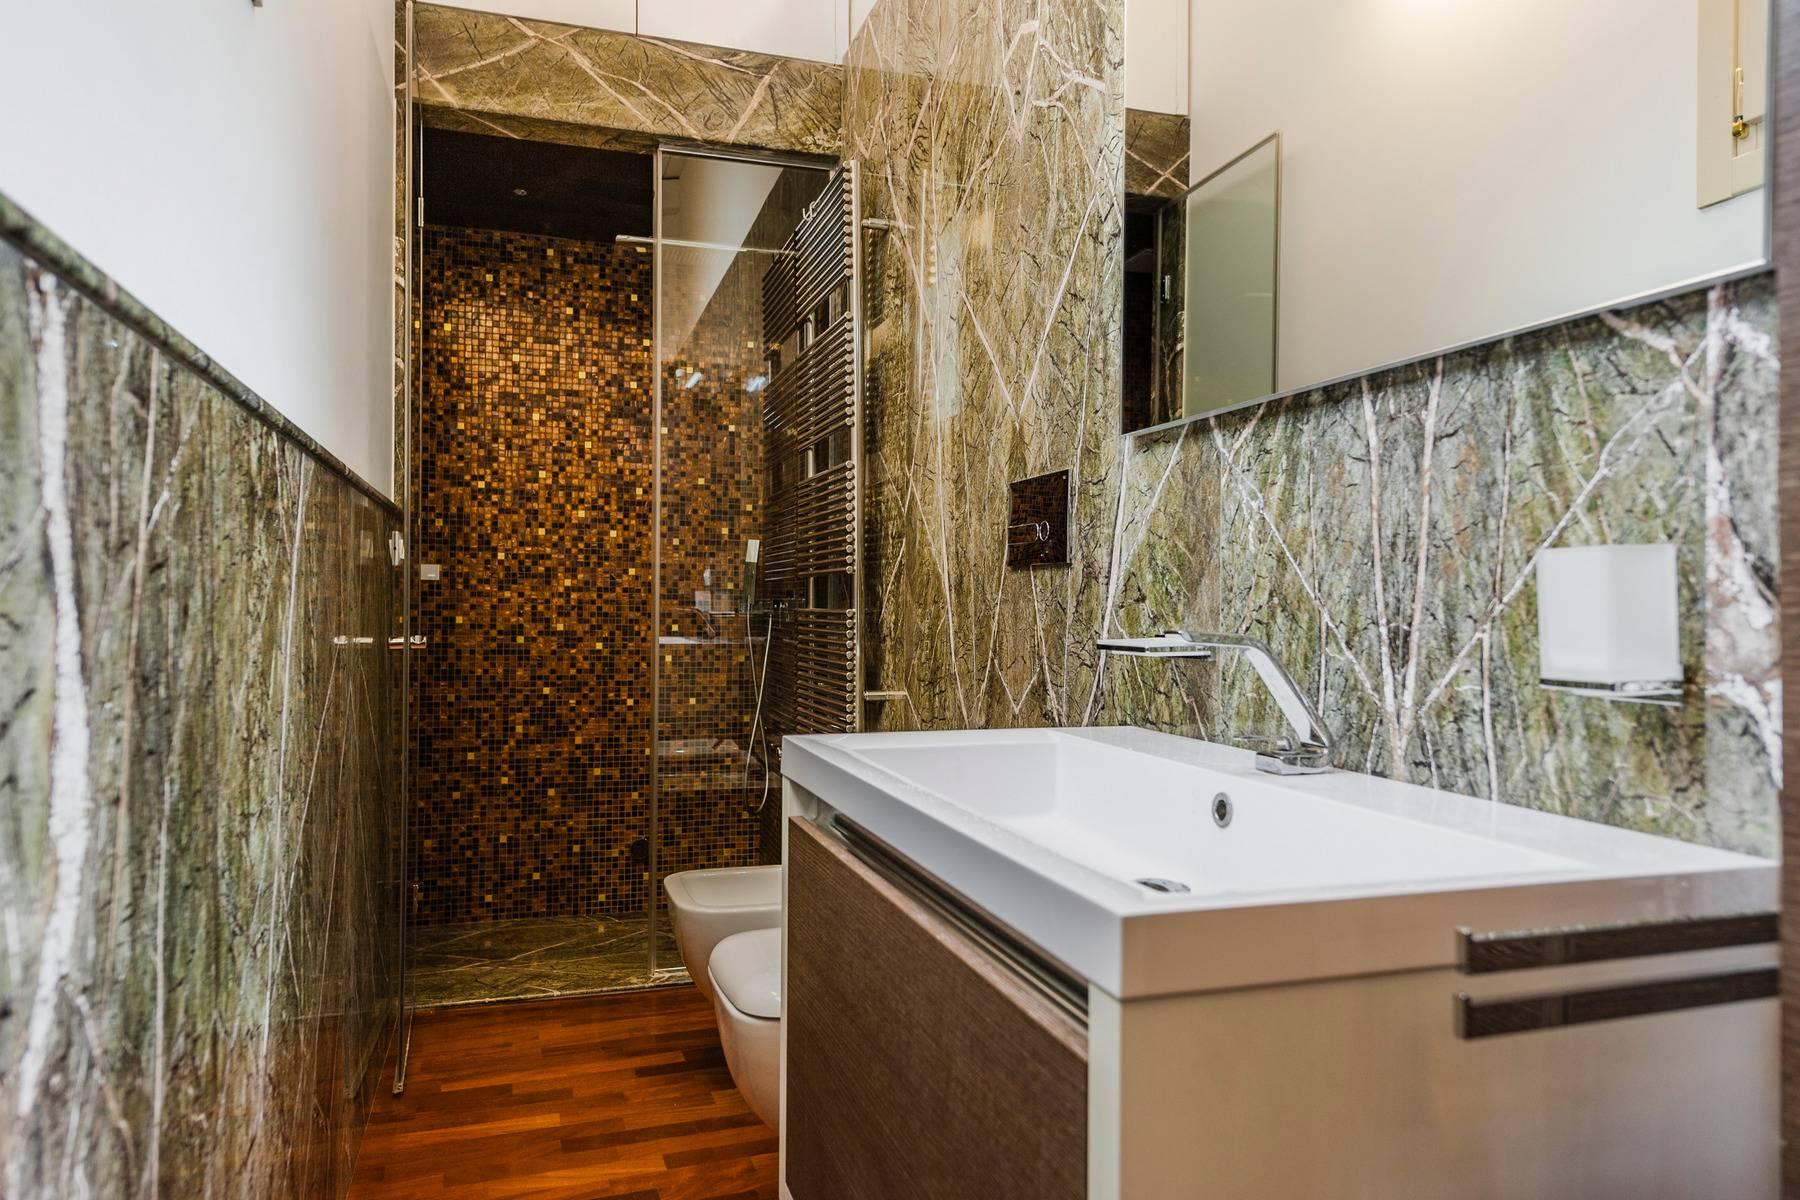 Appartamento in Vendita a Siracusa: 5 locali, 206 mq - Foto 26